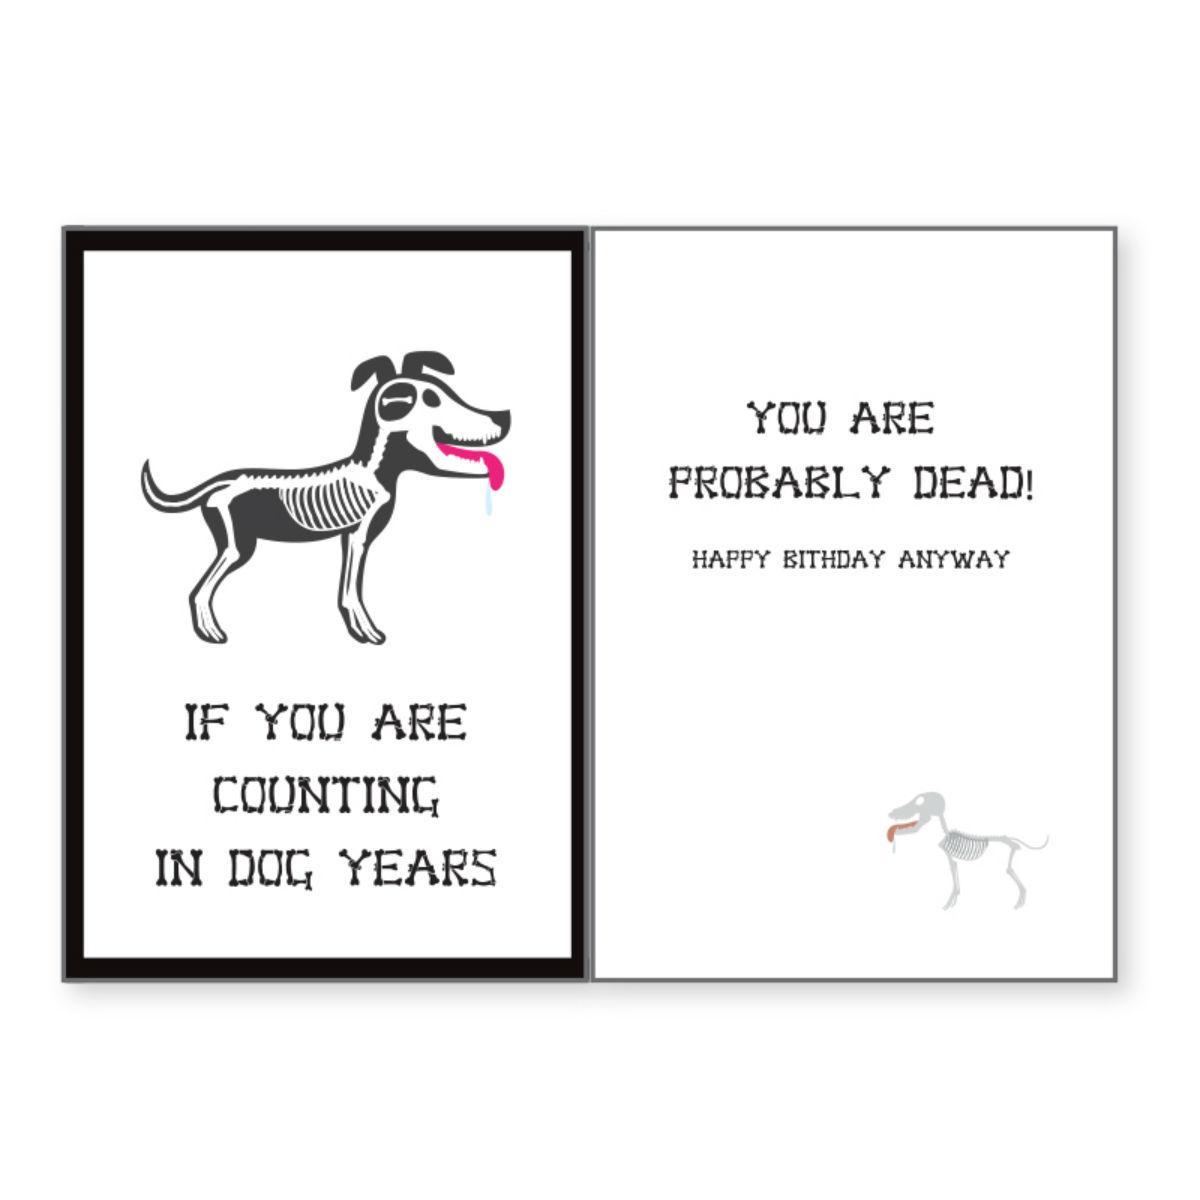 Birthday Greeting Card by Dog Speak - In Dog Years...